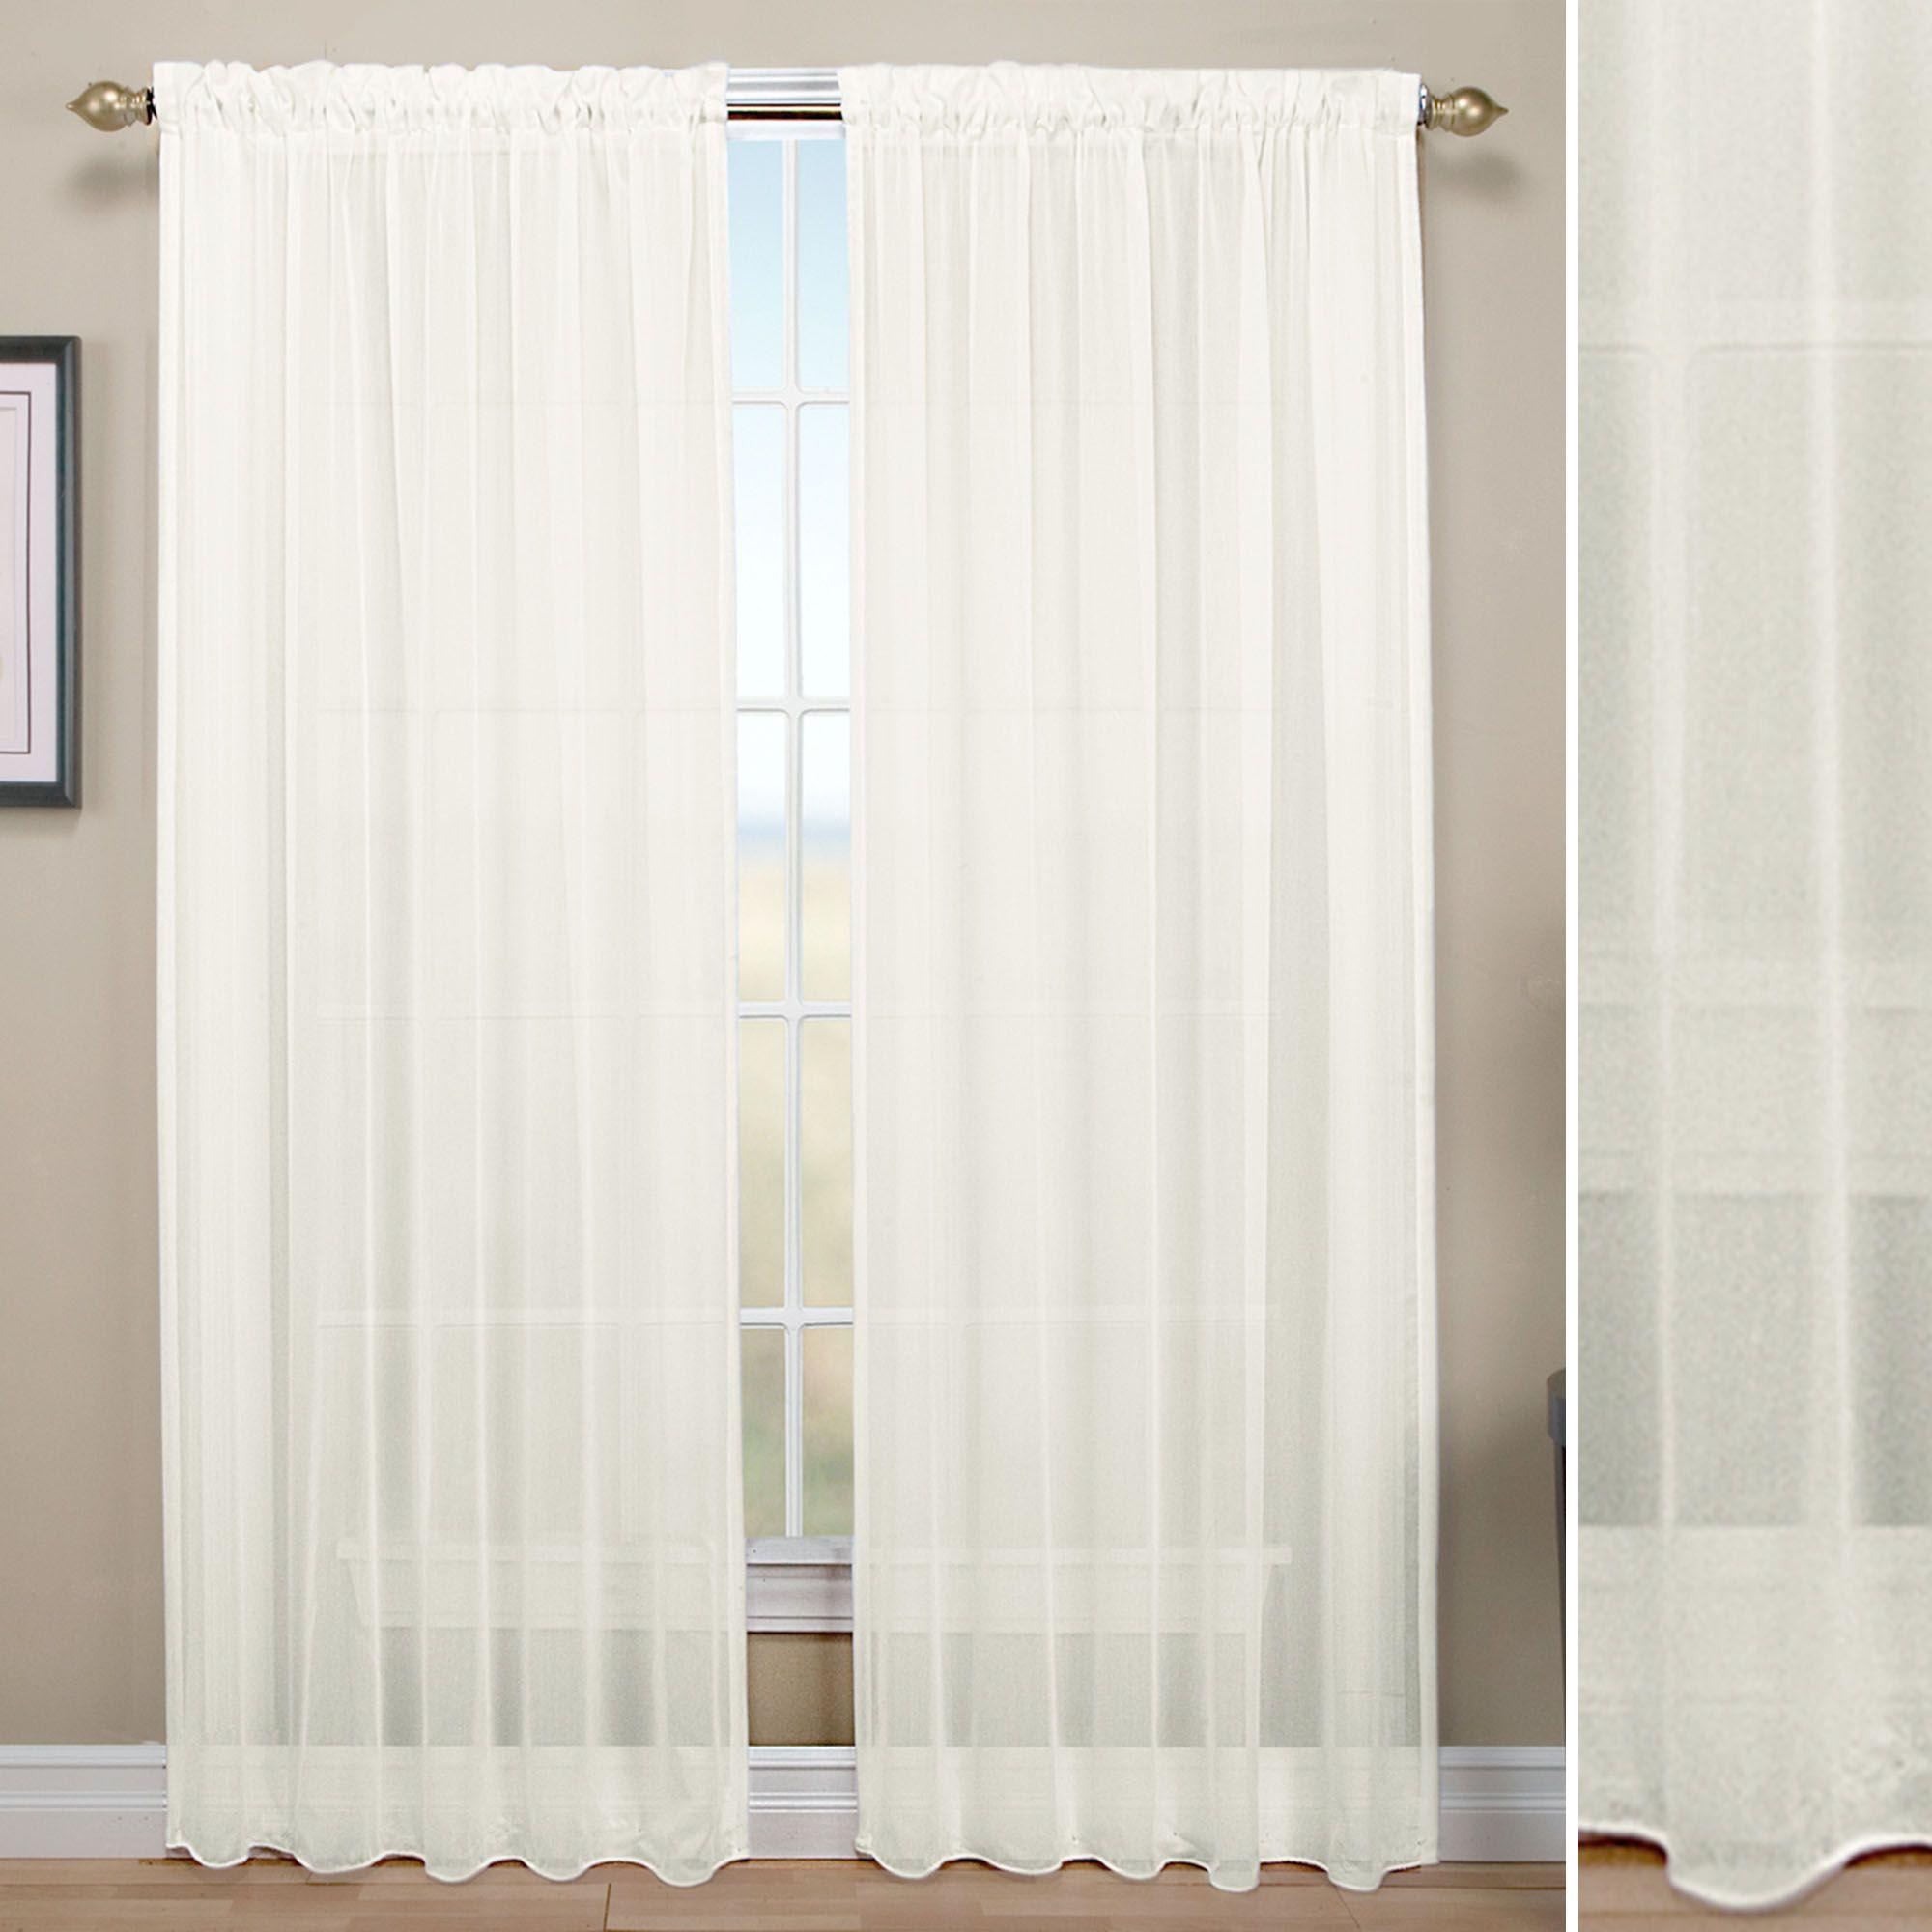 Tergaline Rod Pocket Sheer Curtain Panel